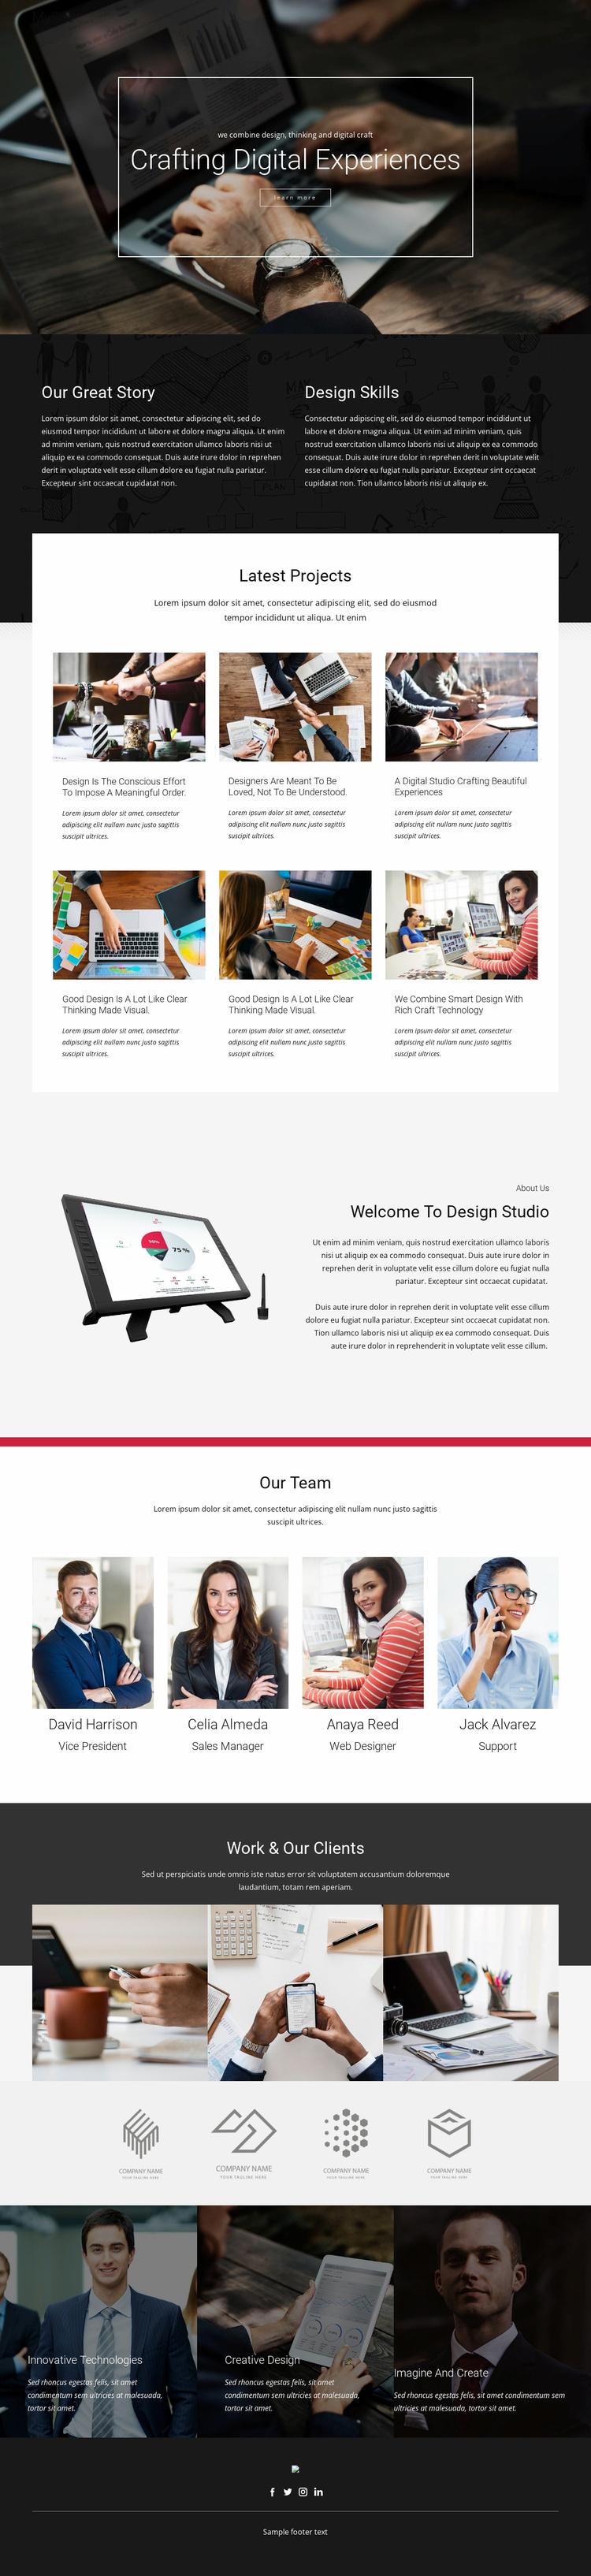 Crafting Digital Design Studio Website Template